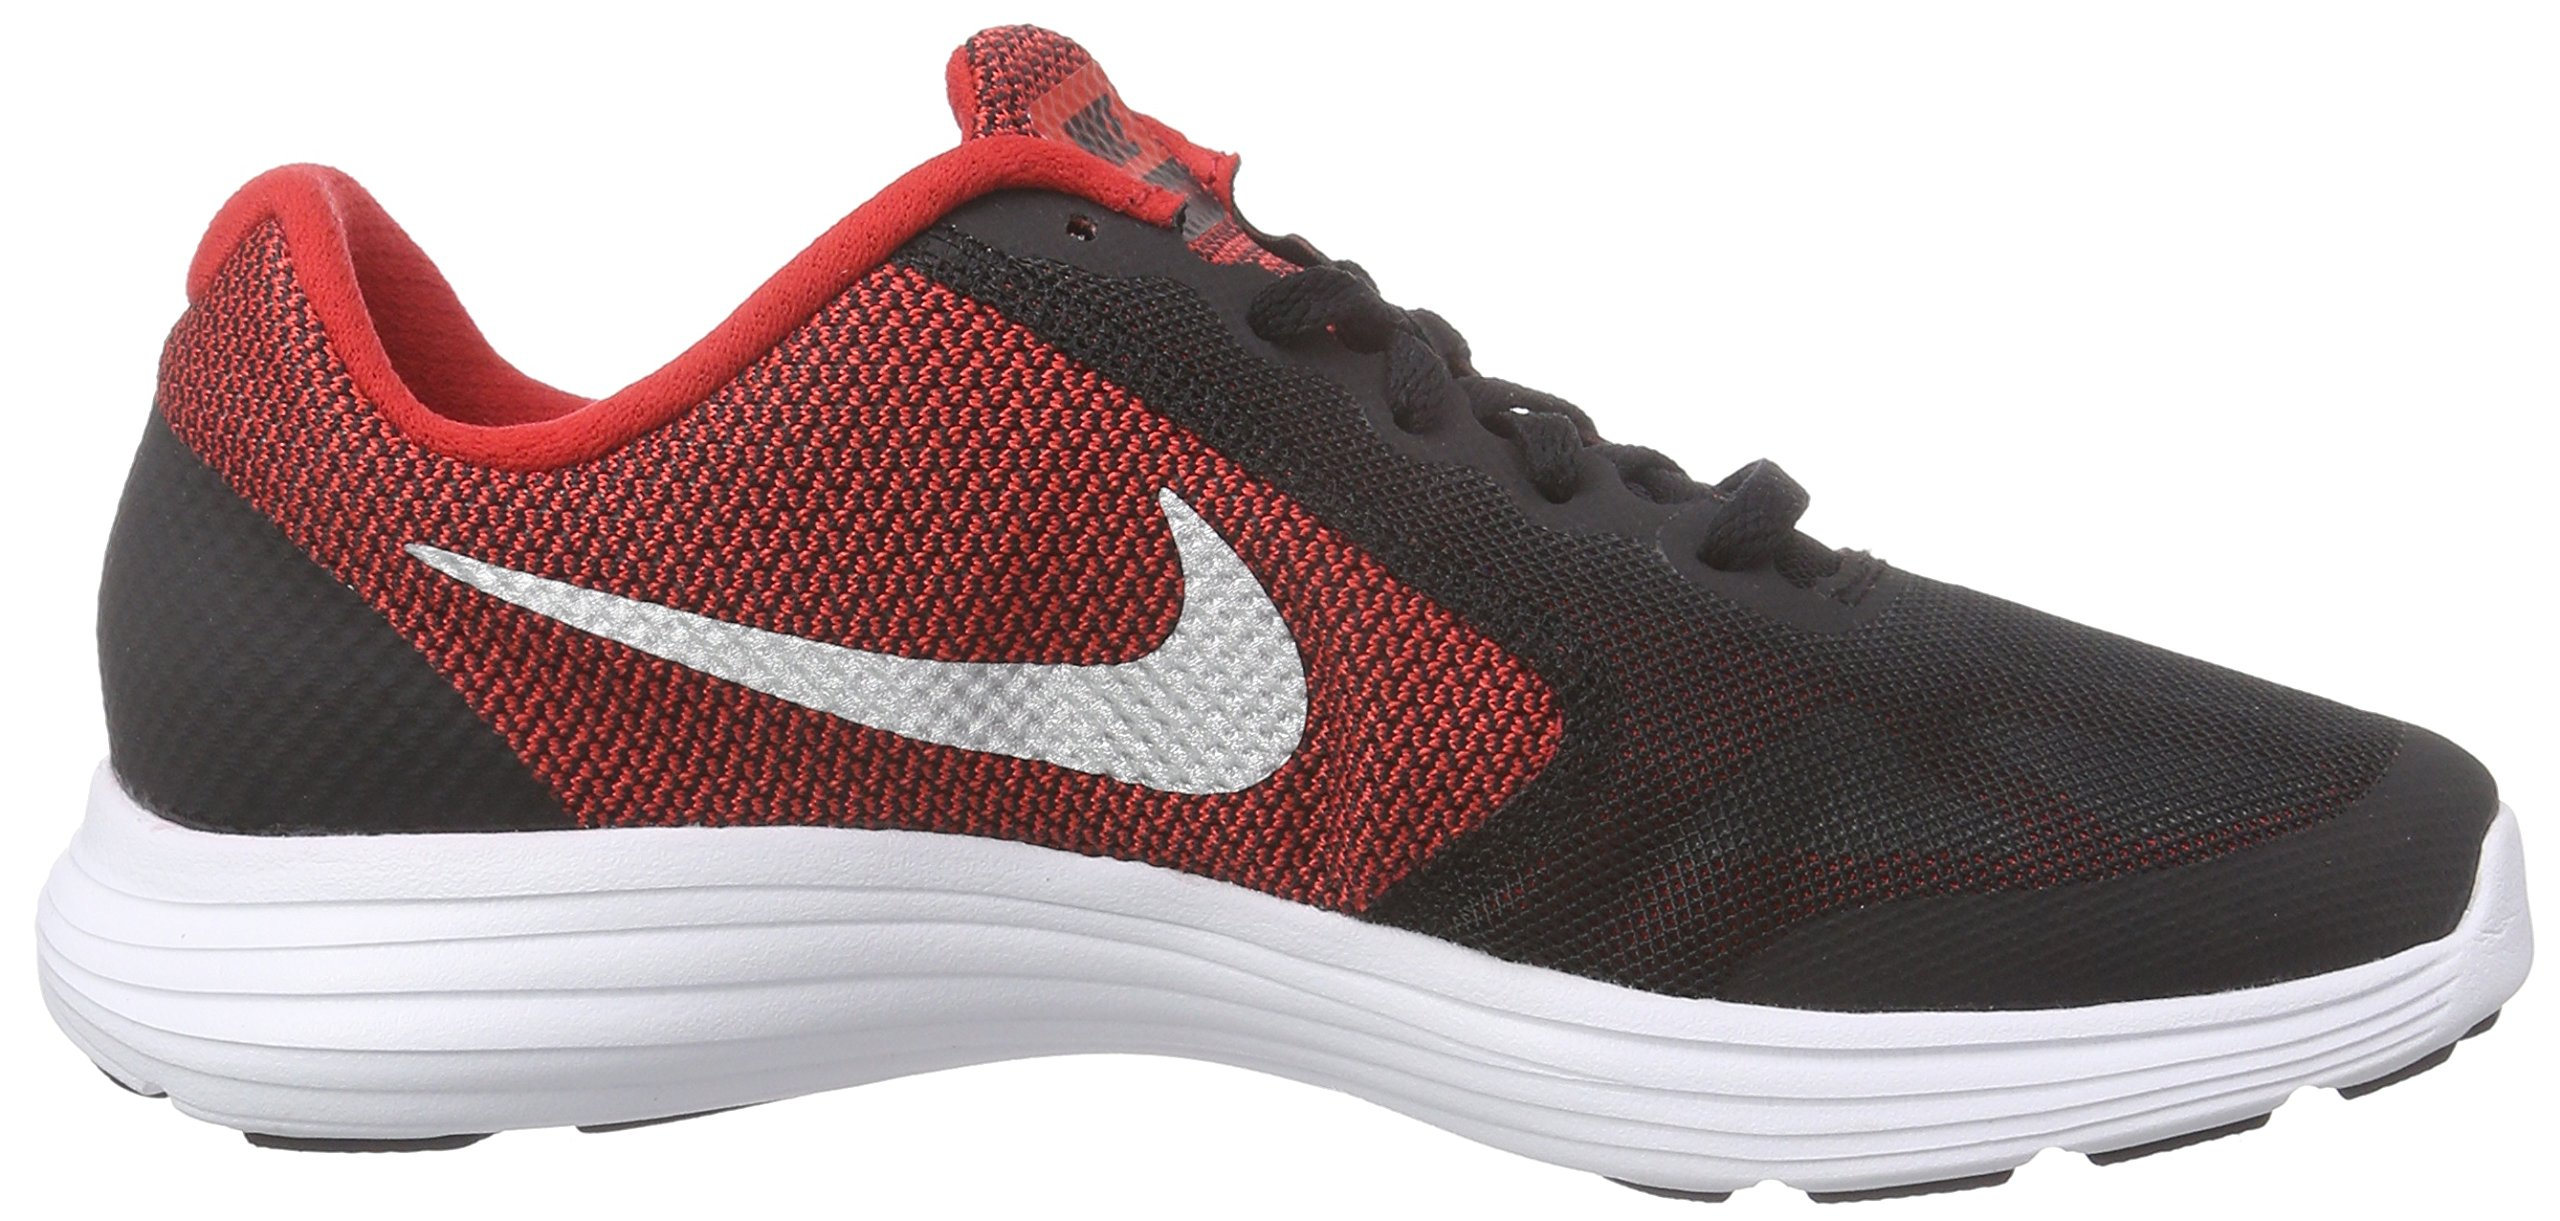 NIKE Boys' Revolution 3 Running Shoe (GS), University Red/Metallic Silver/Black, 3.5 M US Big Kid by Nike (Image #6)